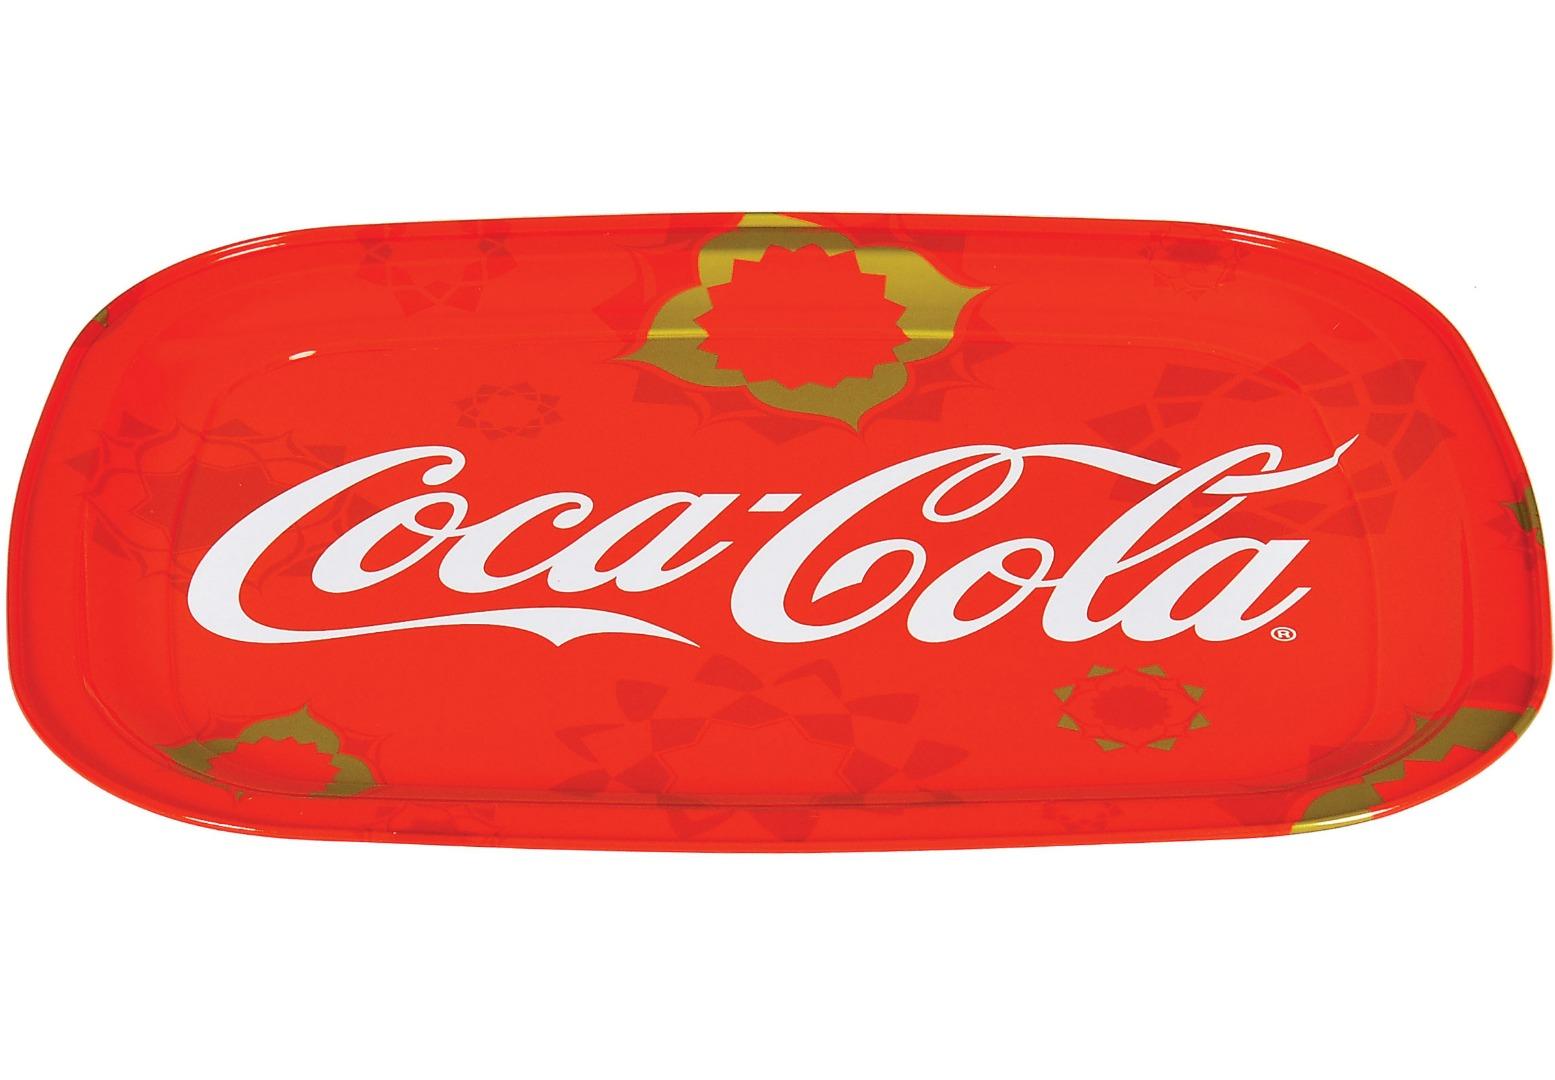 Coca Cola - 304x234 - Metal Tray - Rectangular -